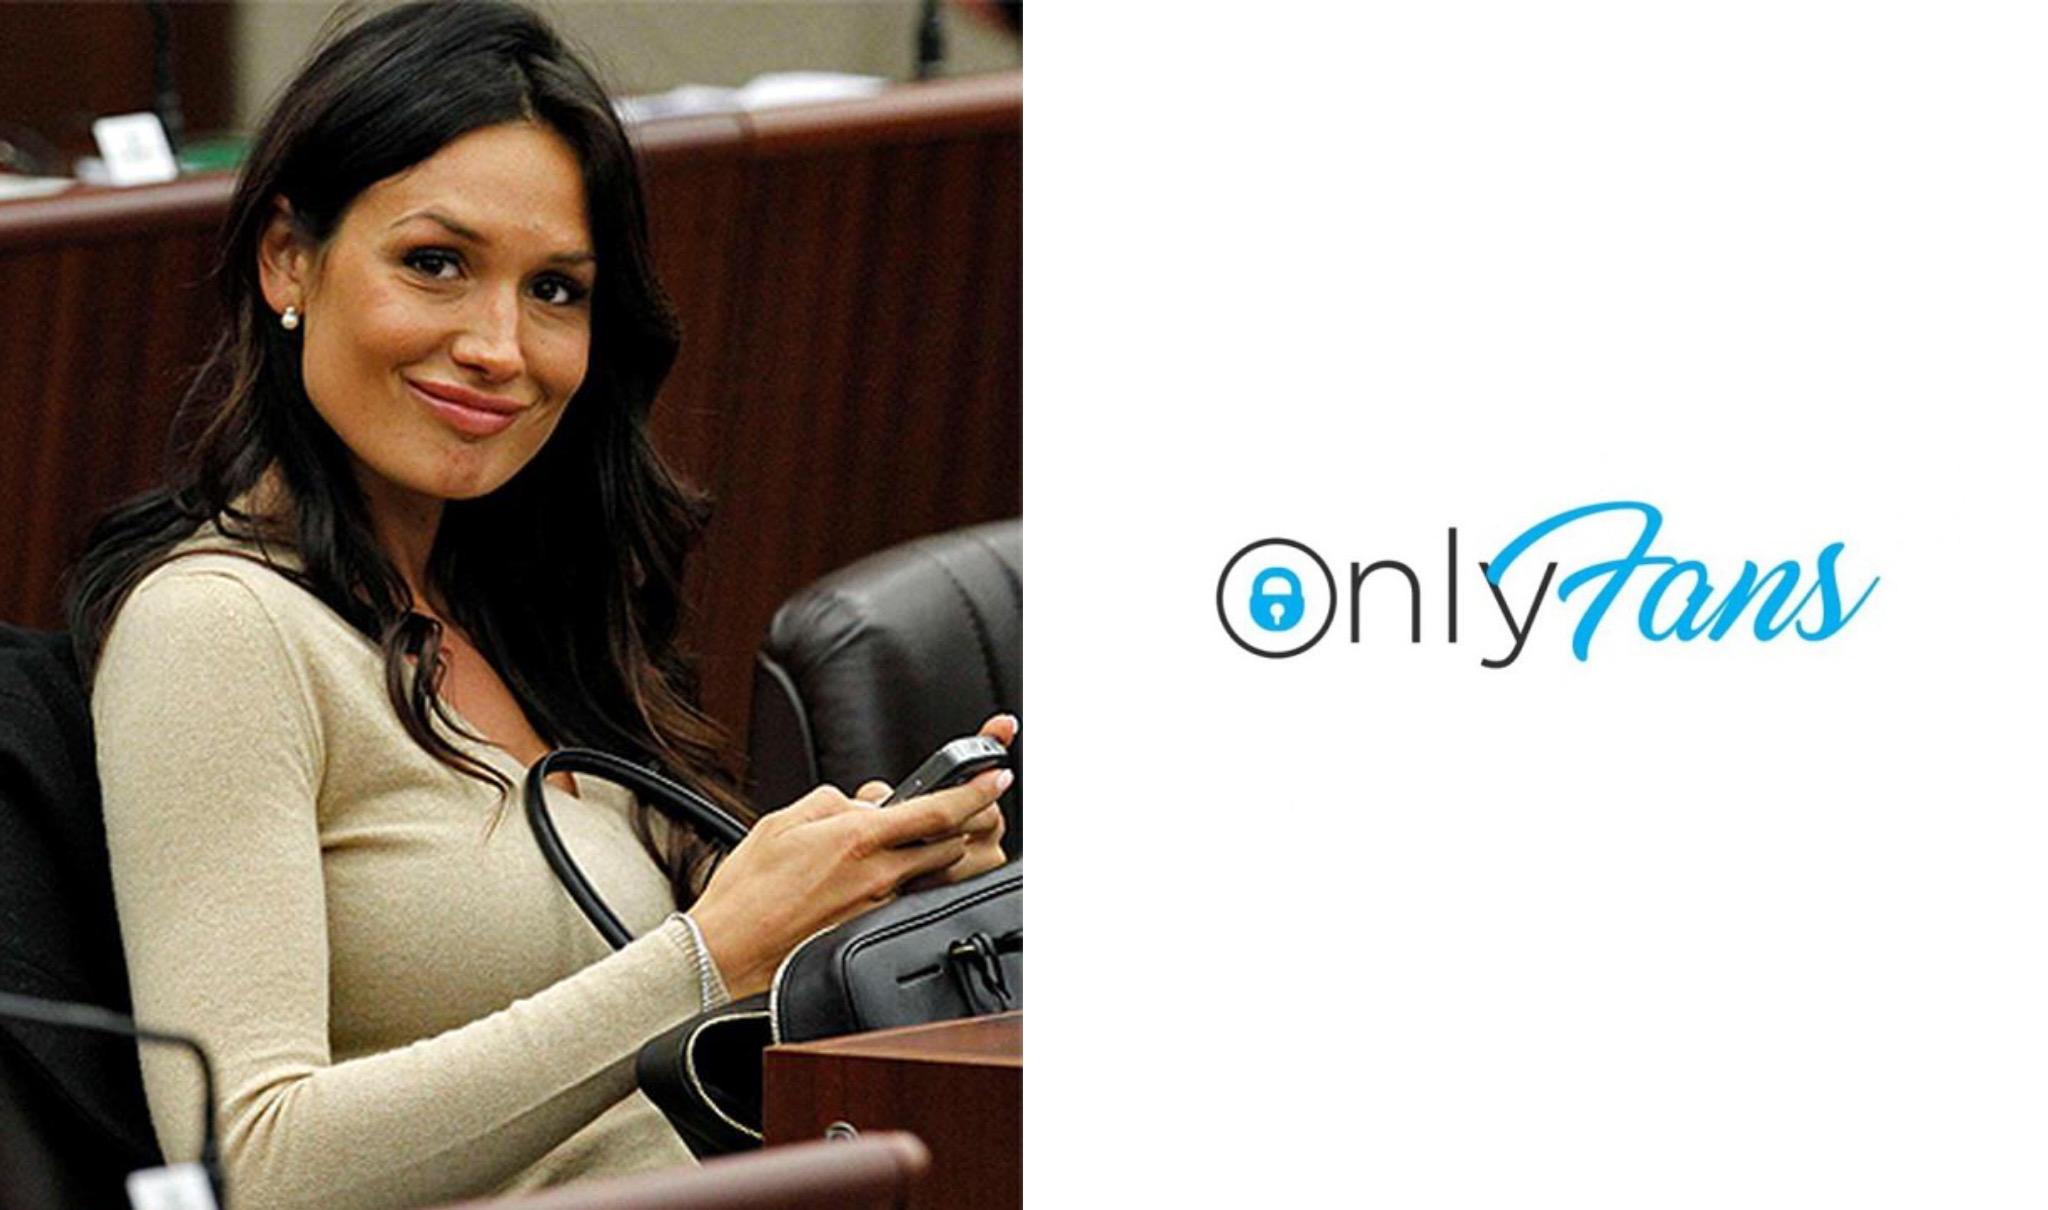 Nicole Minetti e logo OnlyFans